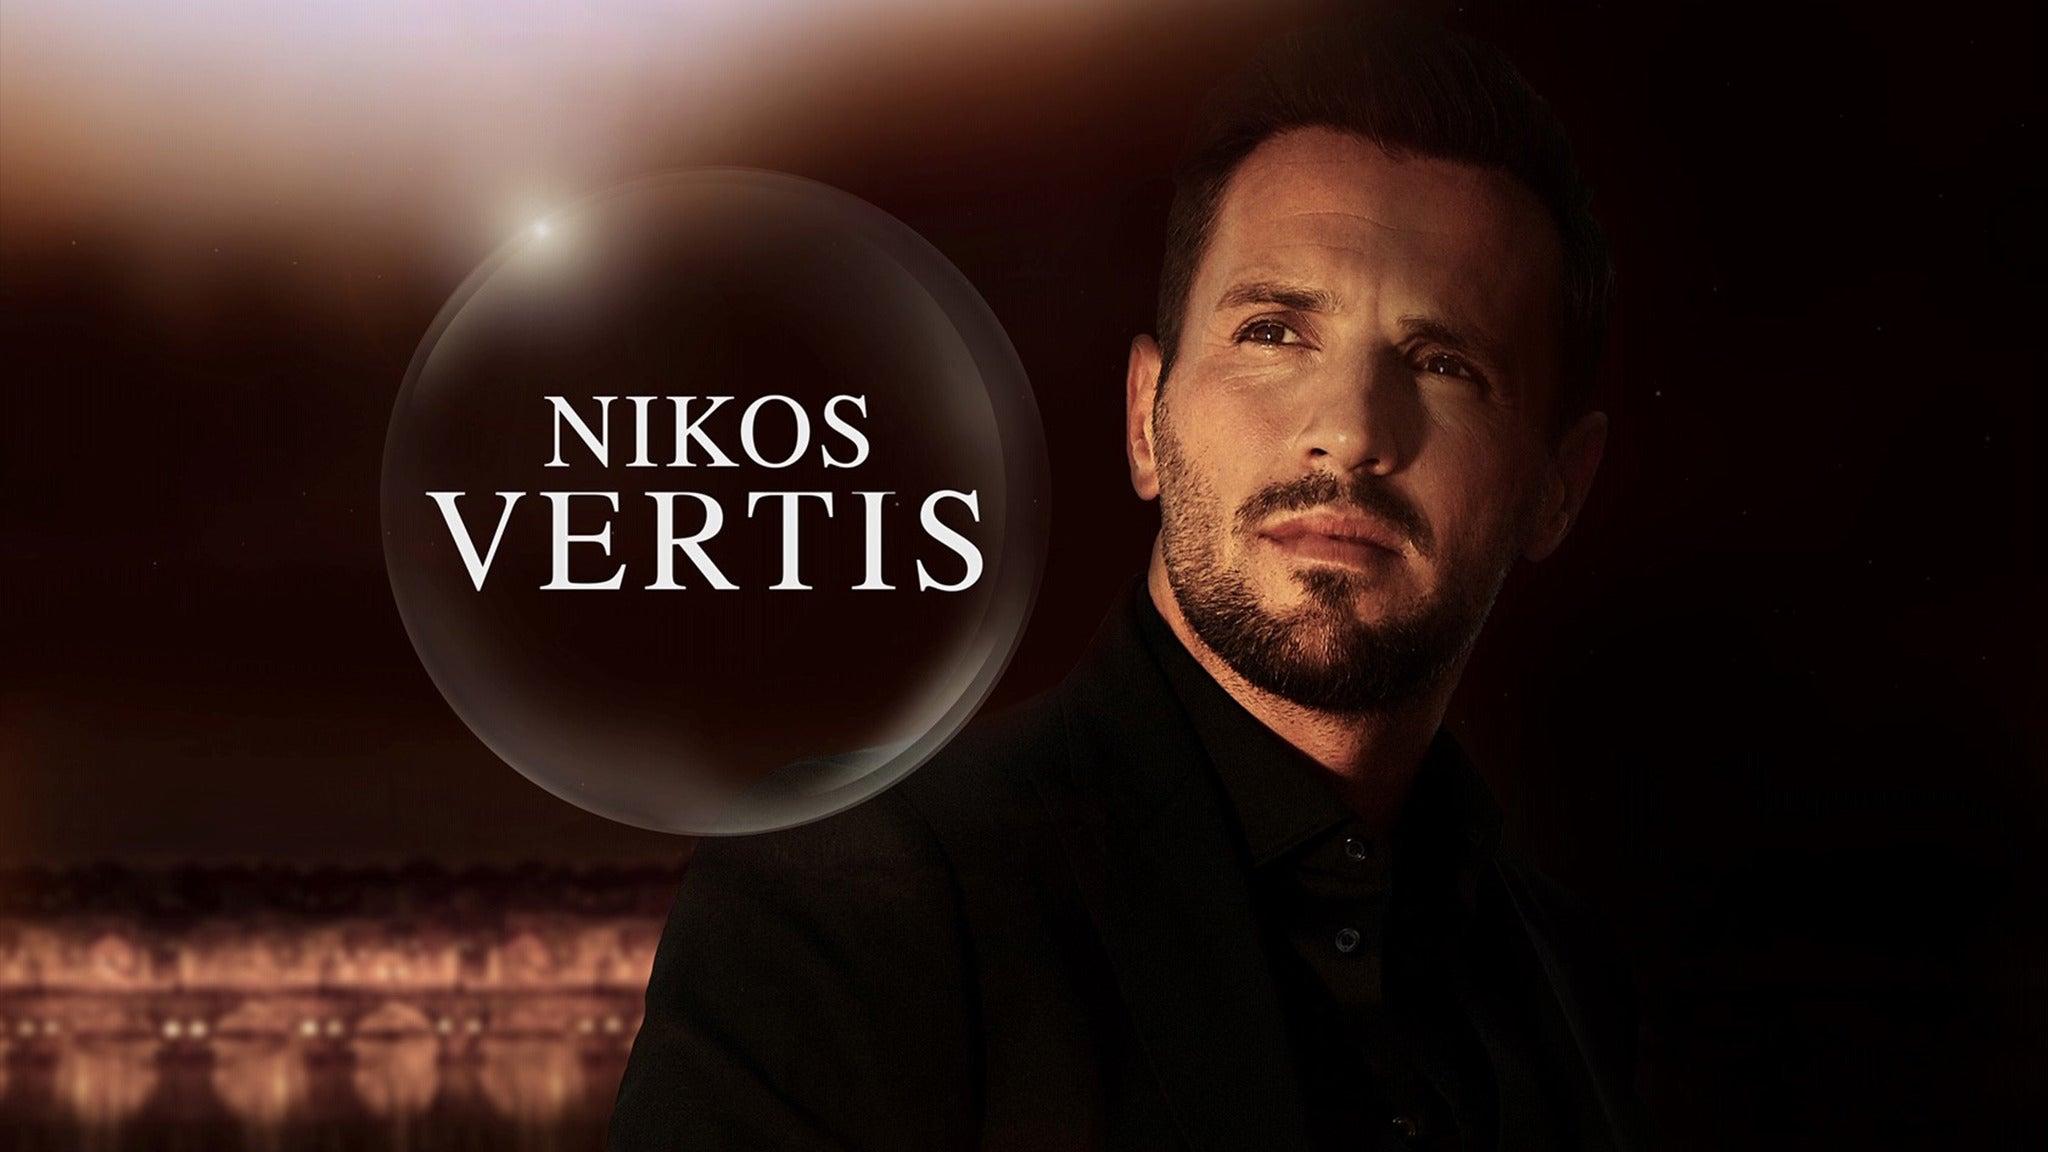 Nikos Vertis at Joe's Live - Rosemont